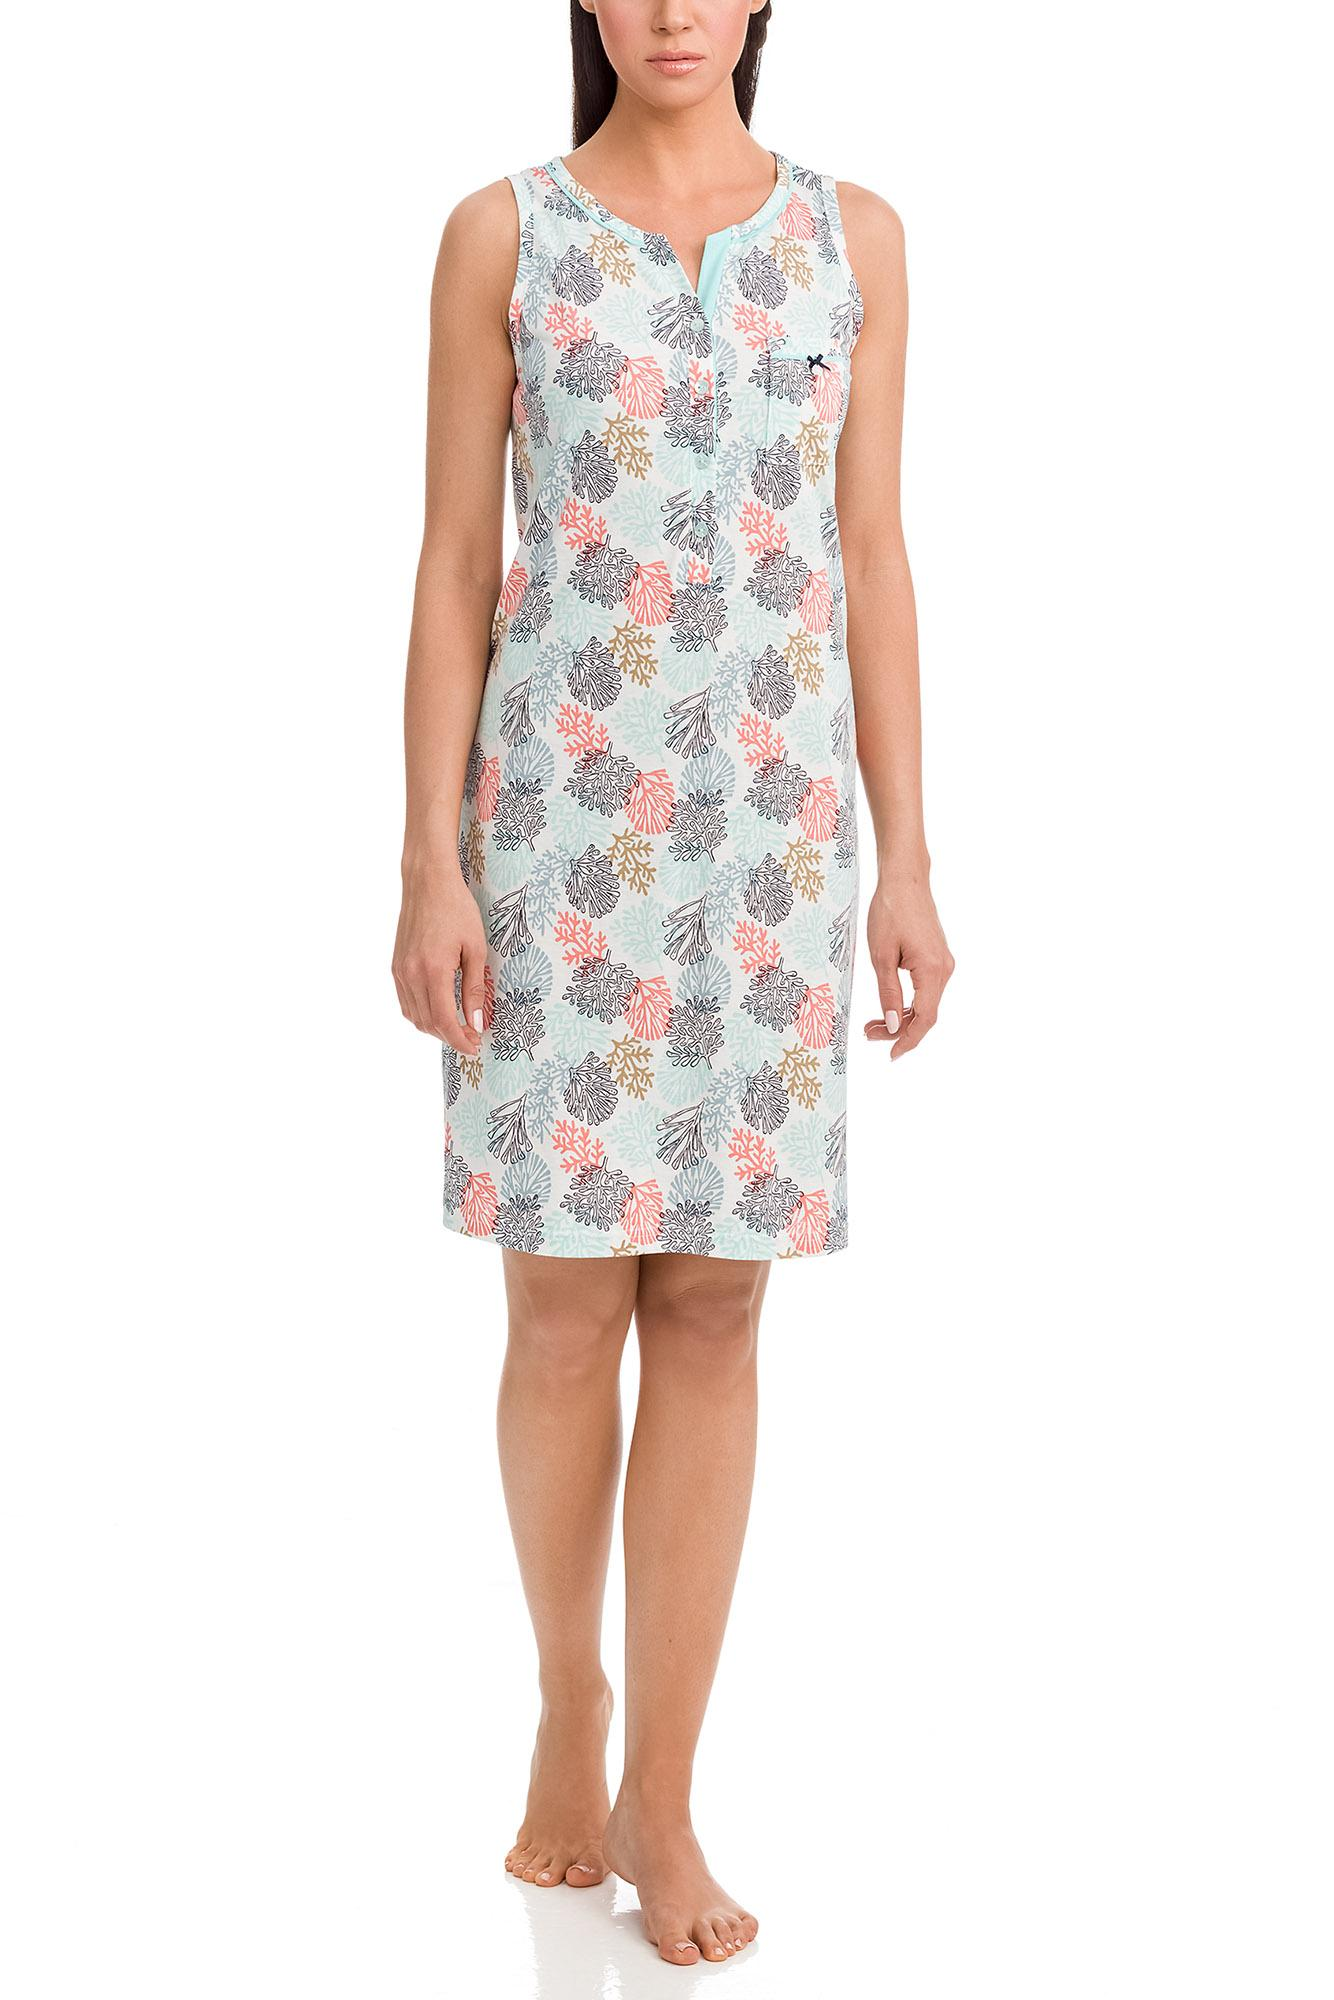 Women's Sleeveless Nightgown